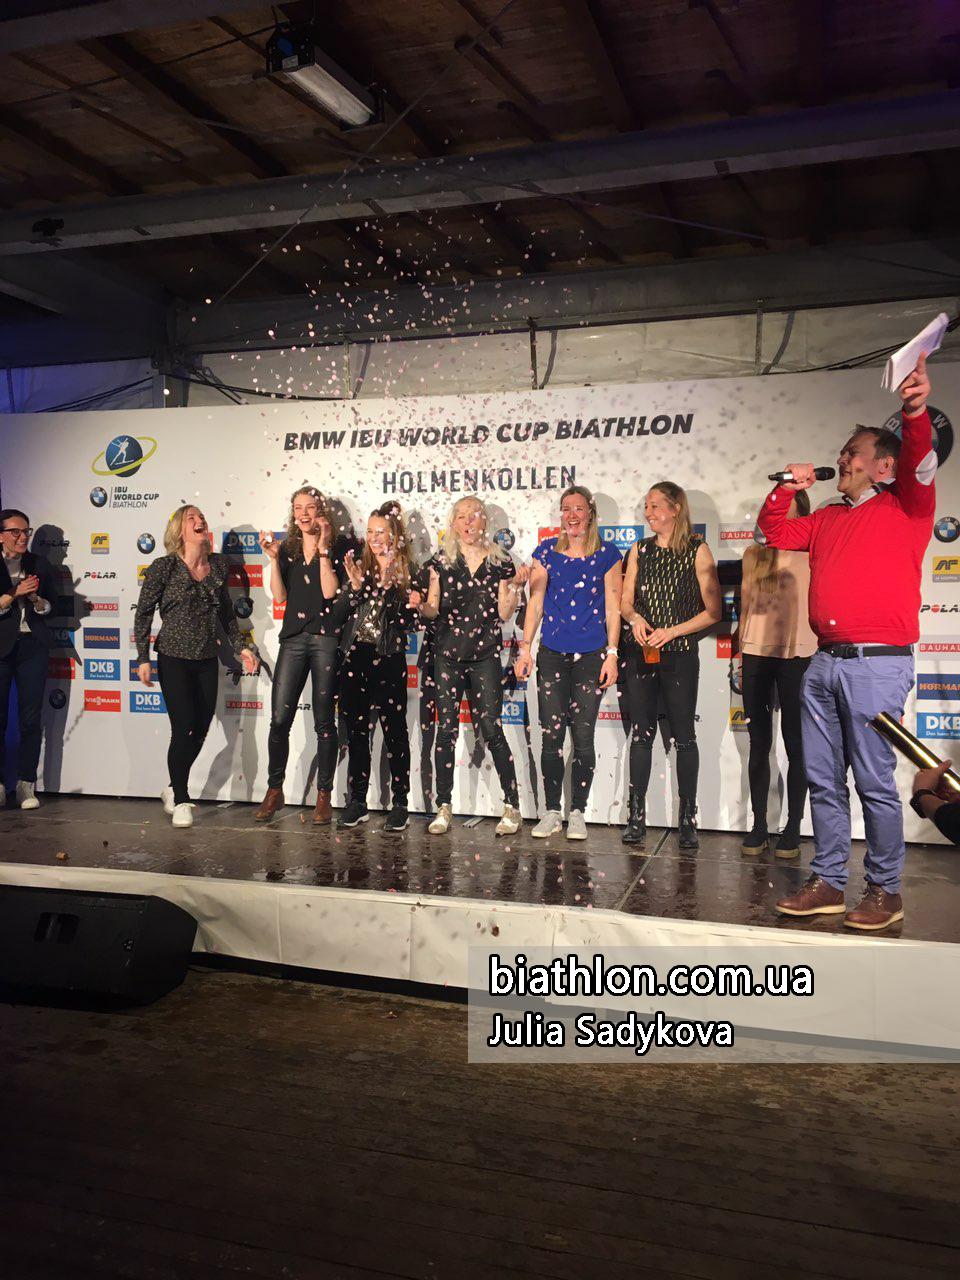 https://www.biathlon.com.ua/uploads/2019/99322.jpg